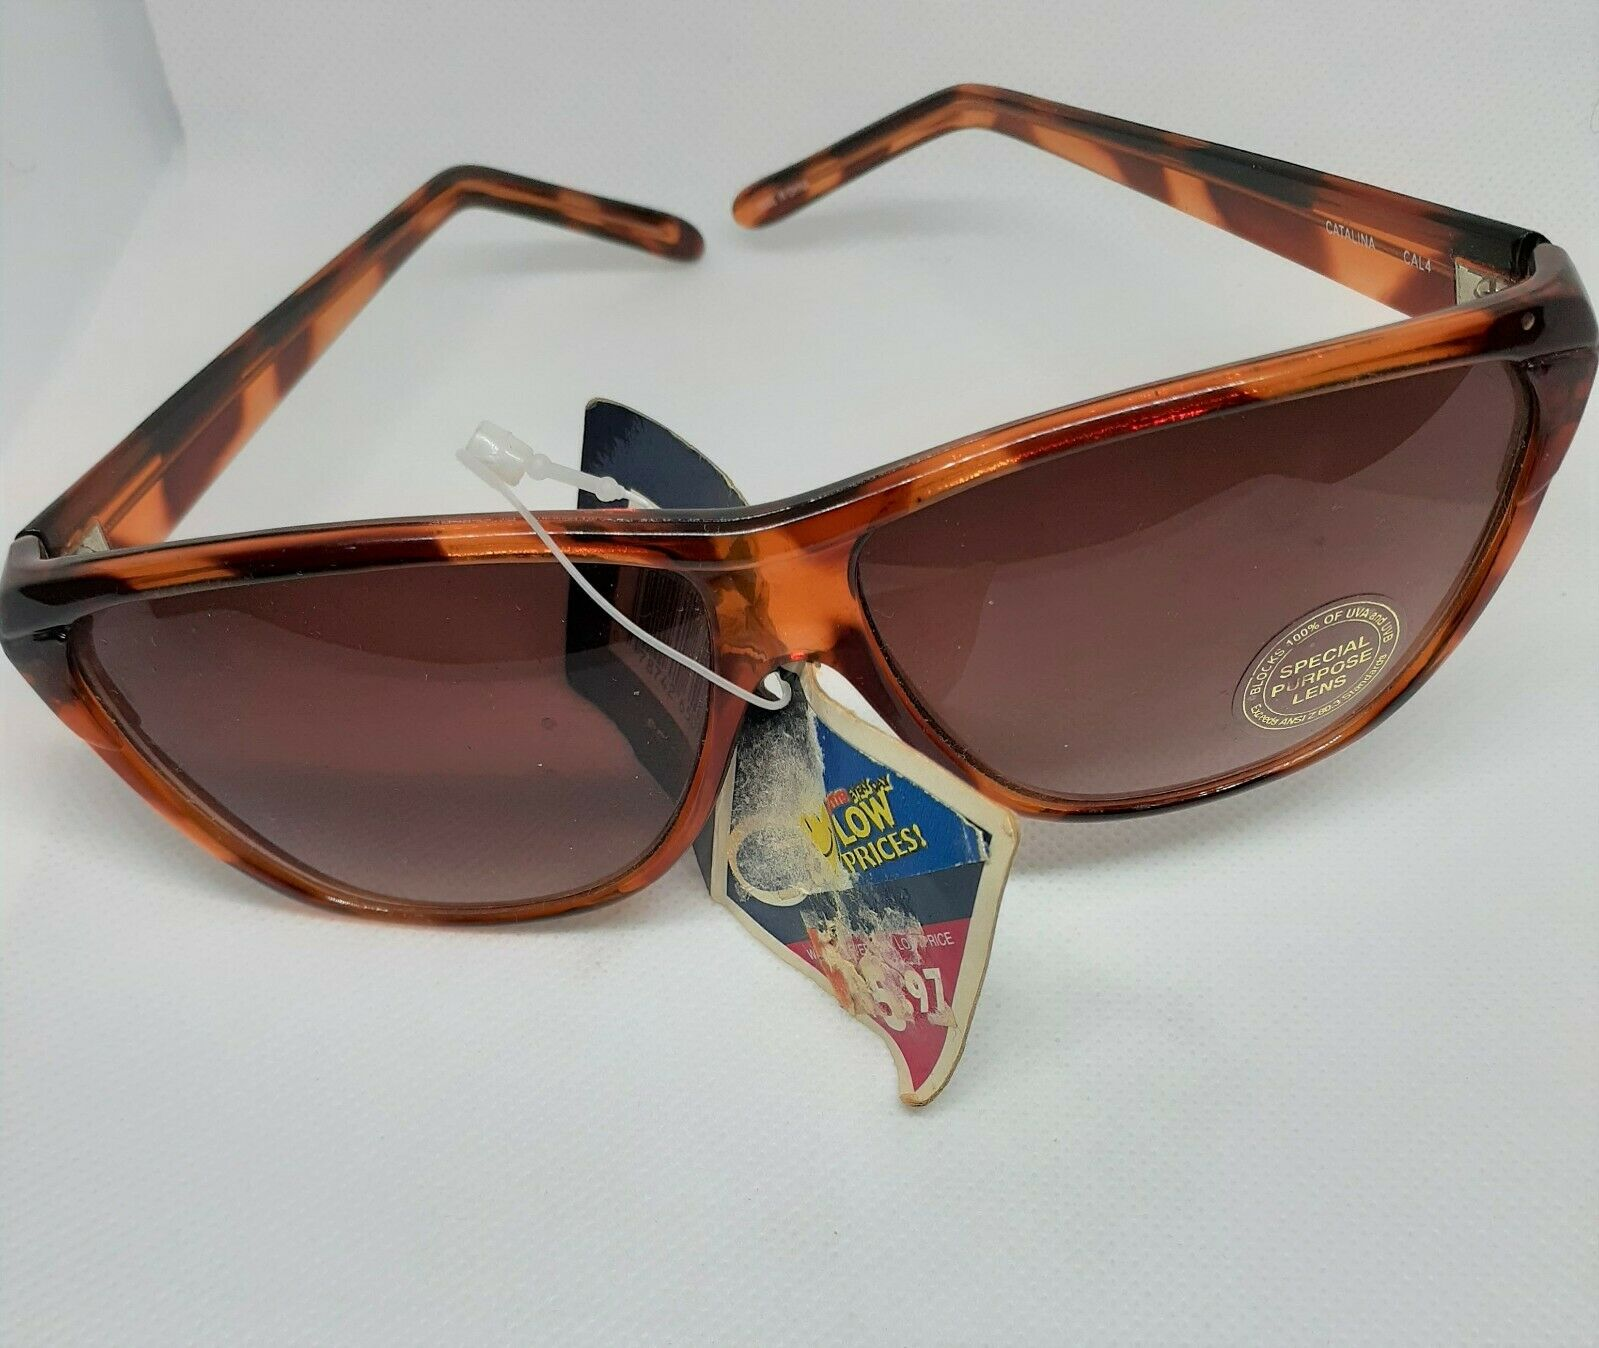 Catalina Women Sunglasses Brown Special Purpose Lens